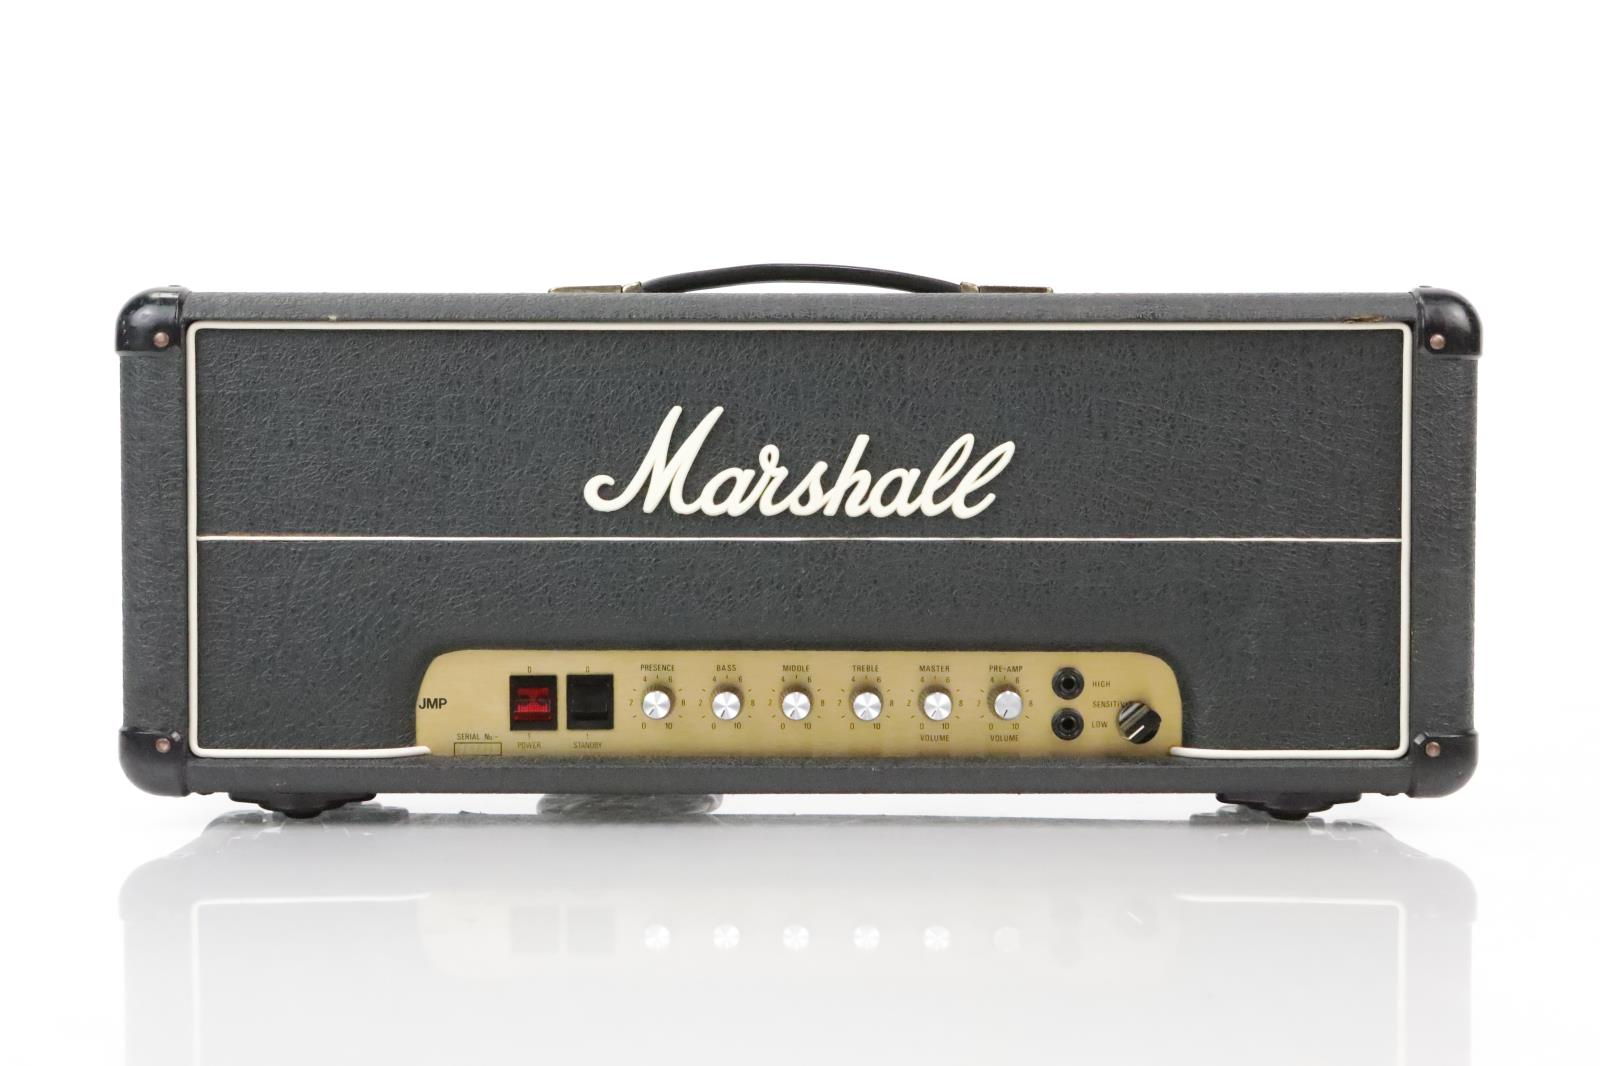 1979 Marshall JMP MKII Master 100W Lead Amp Morin Mod Ross Hogarth #34554